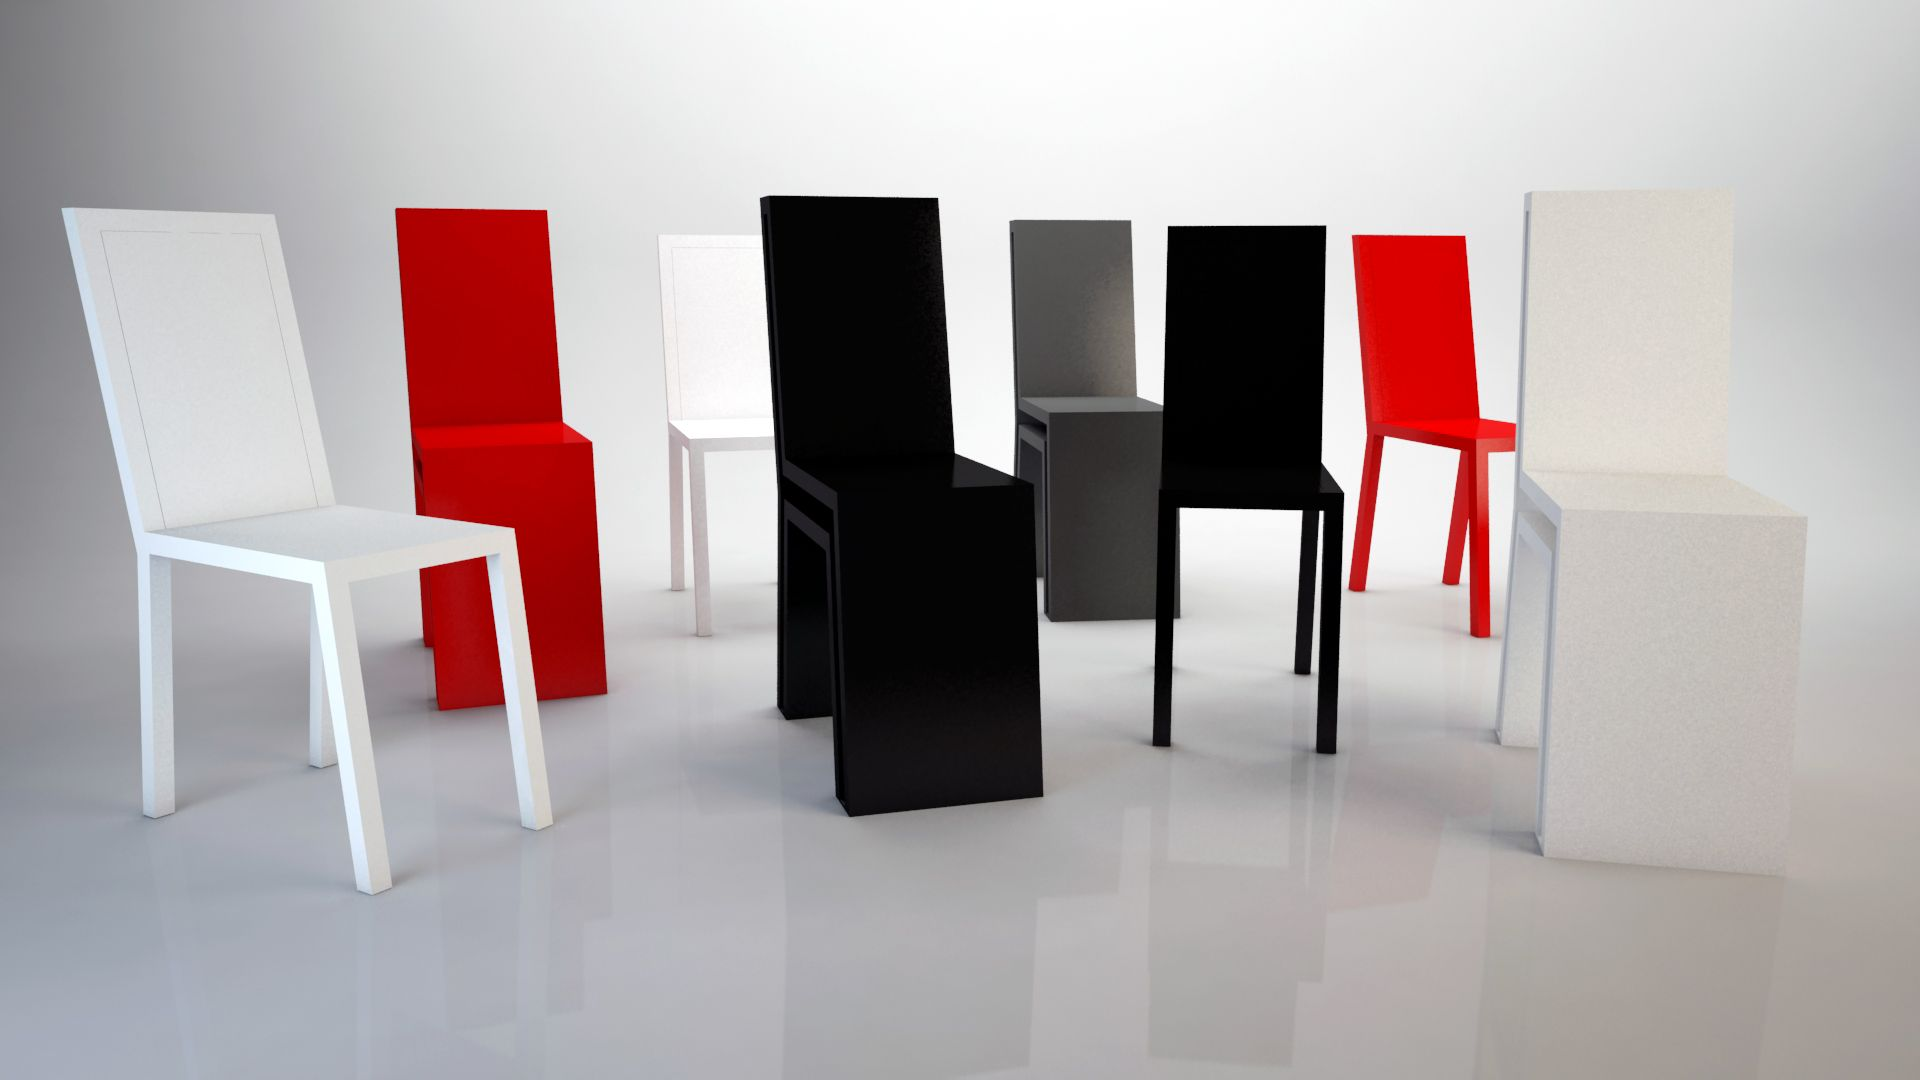 SEDIA TIRA/SPINGI MADE IN ITALY Info:1910@diciannovediecidesign.it #arredamento #homedesign #interiordesign #chair